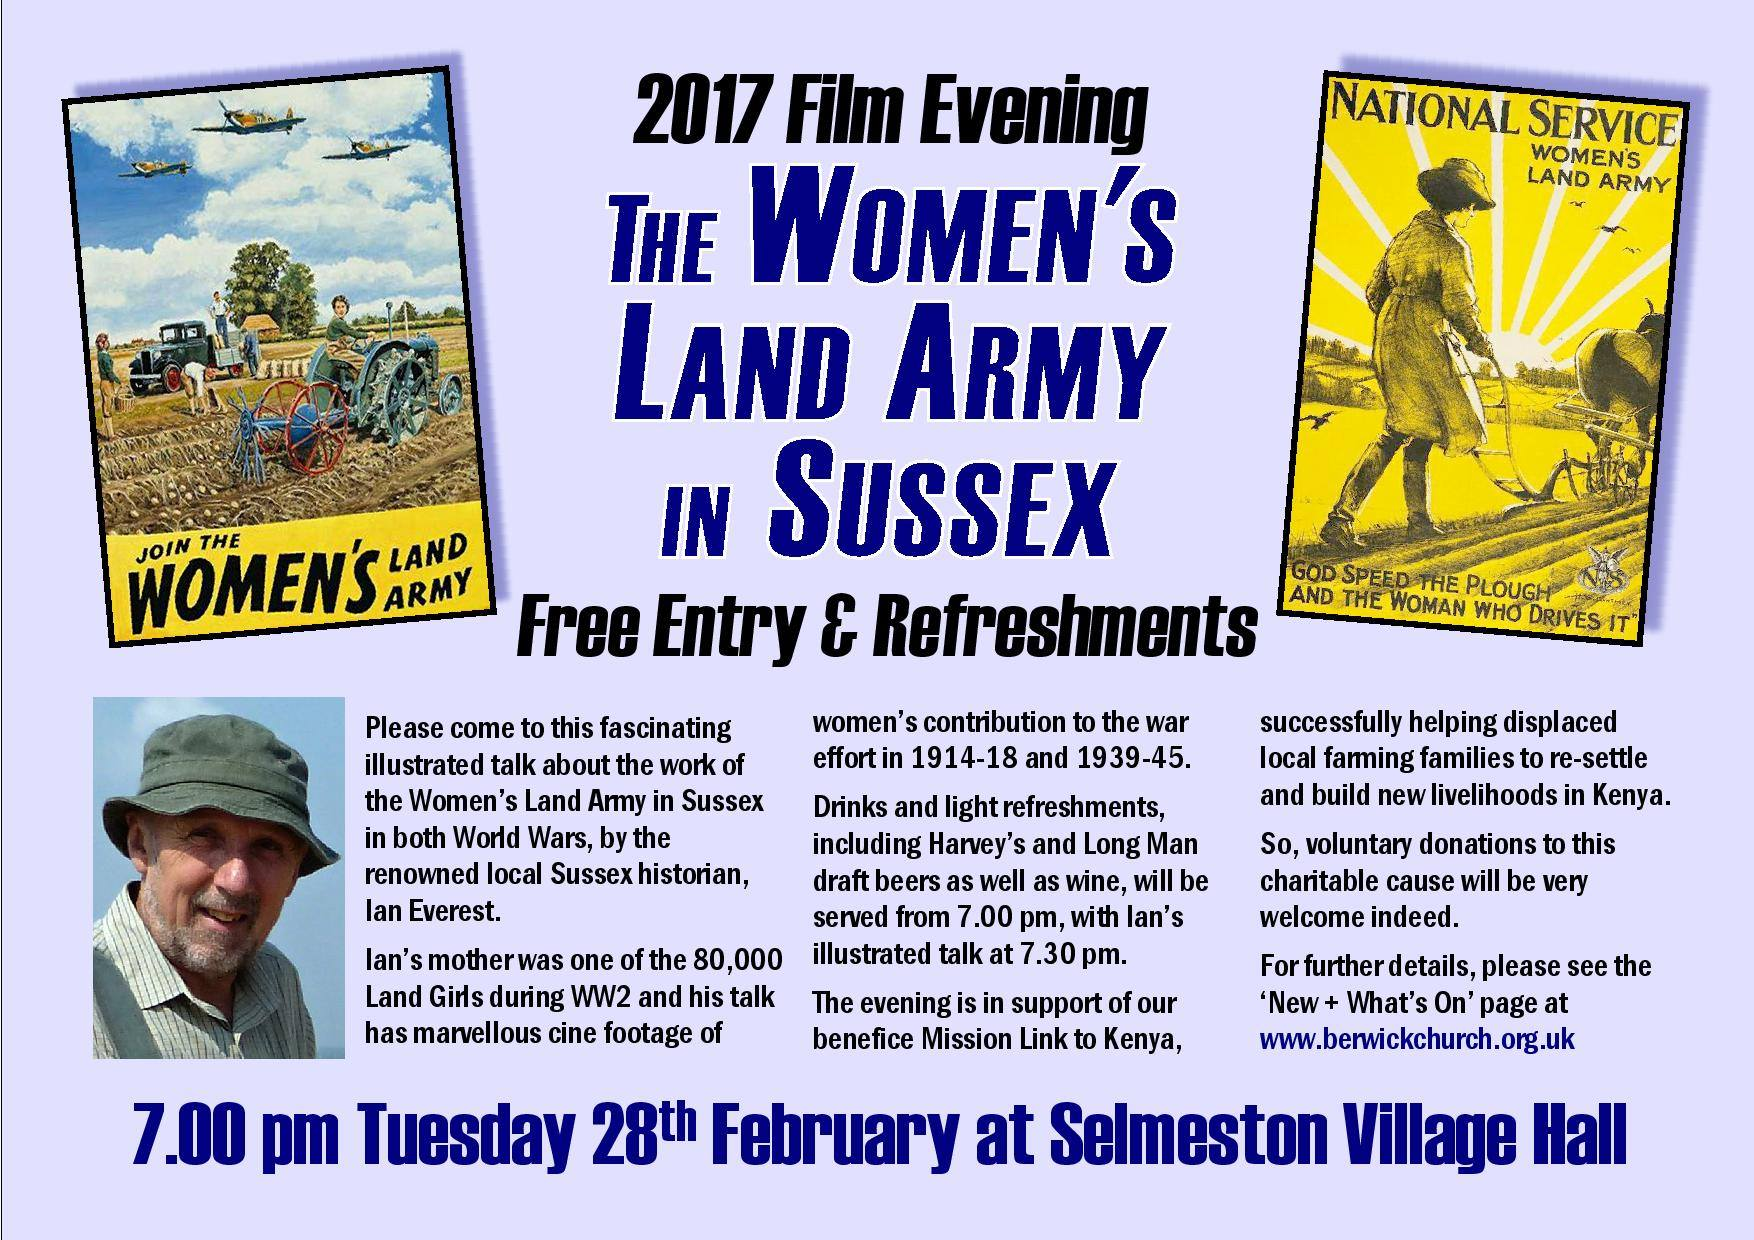 Women's Land Army evening - Selmeston Village Hall, near Lewes, East Sussex, BN26 6UG